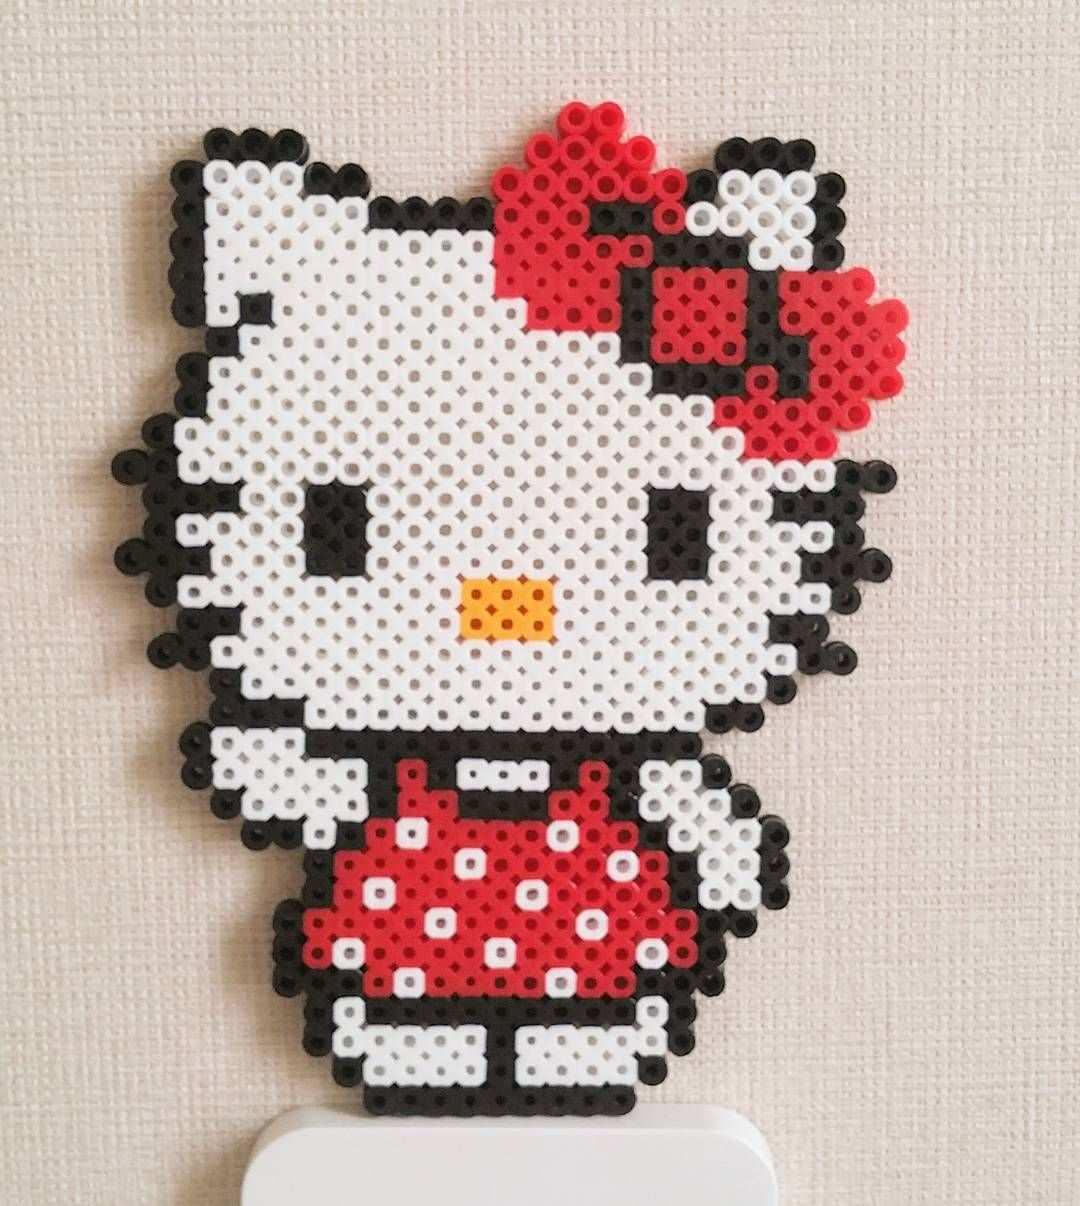 Hello Kitty Template Diseno Molde Plantilla Abalorios Calor Hamma Hama Perler Beads Patterns Perler Bead Art Hama Beads Design Melty Bead Patterns